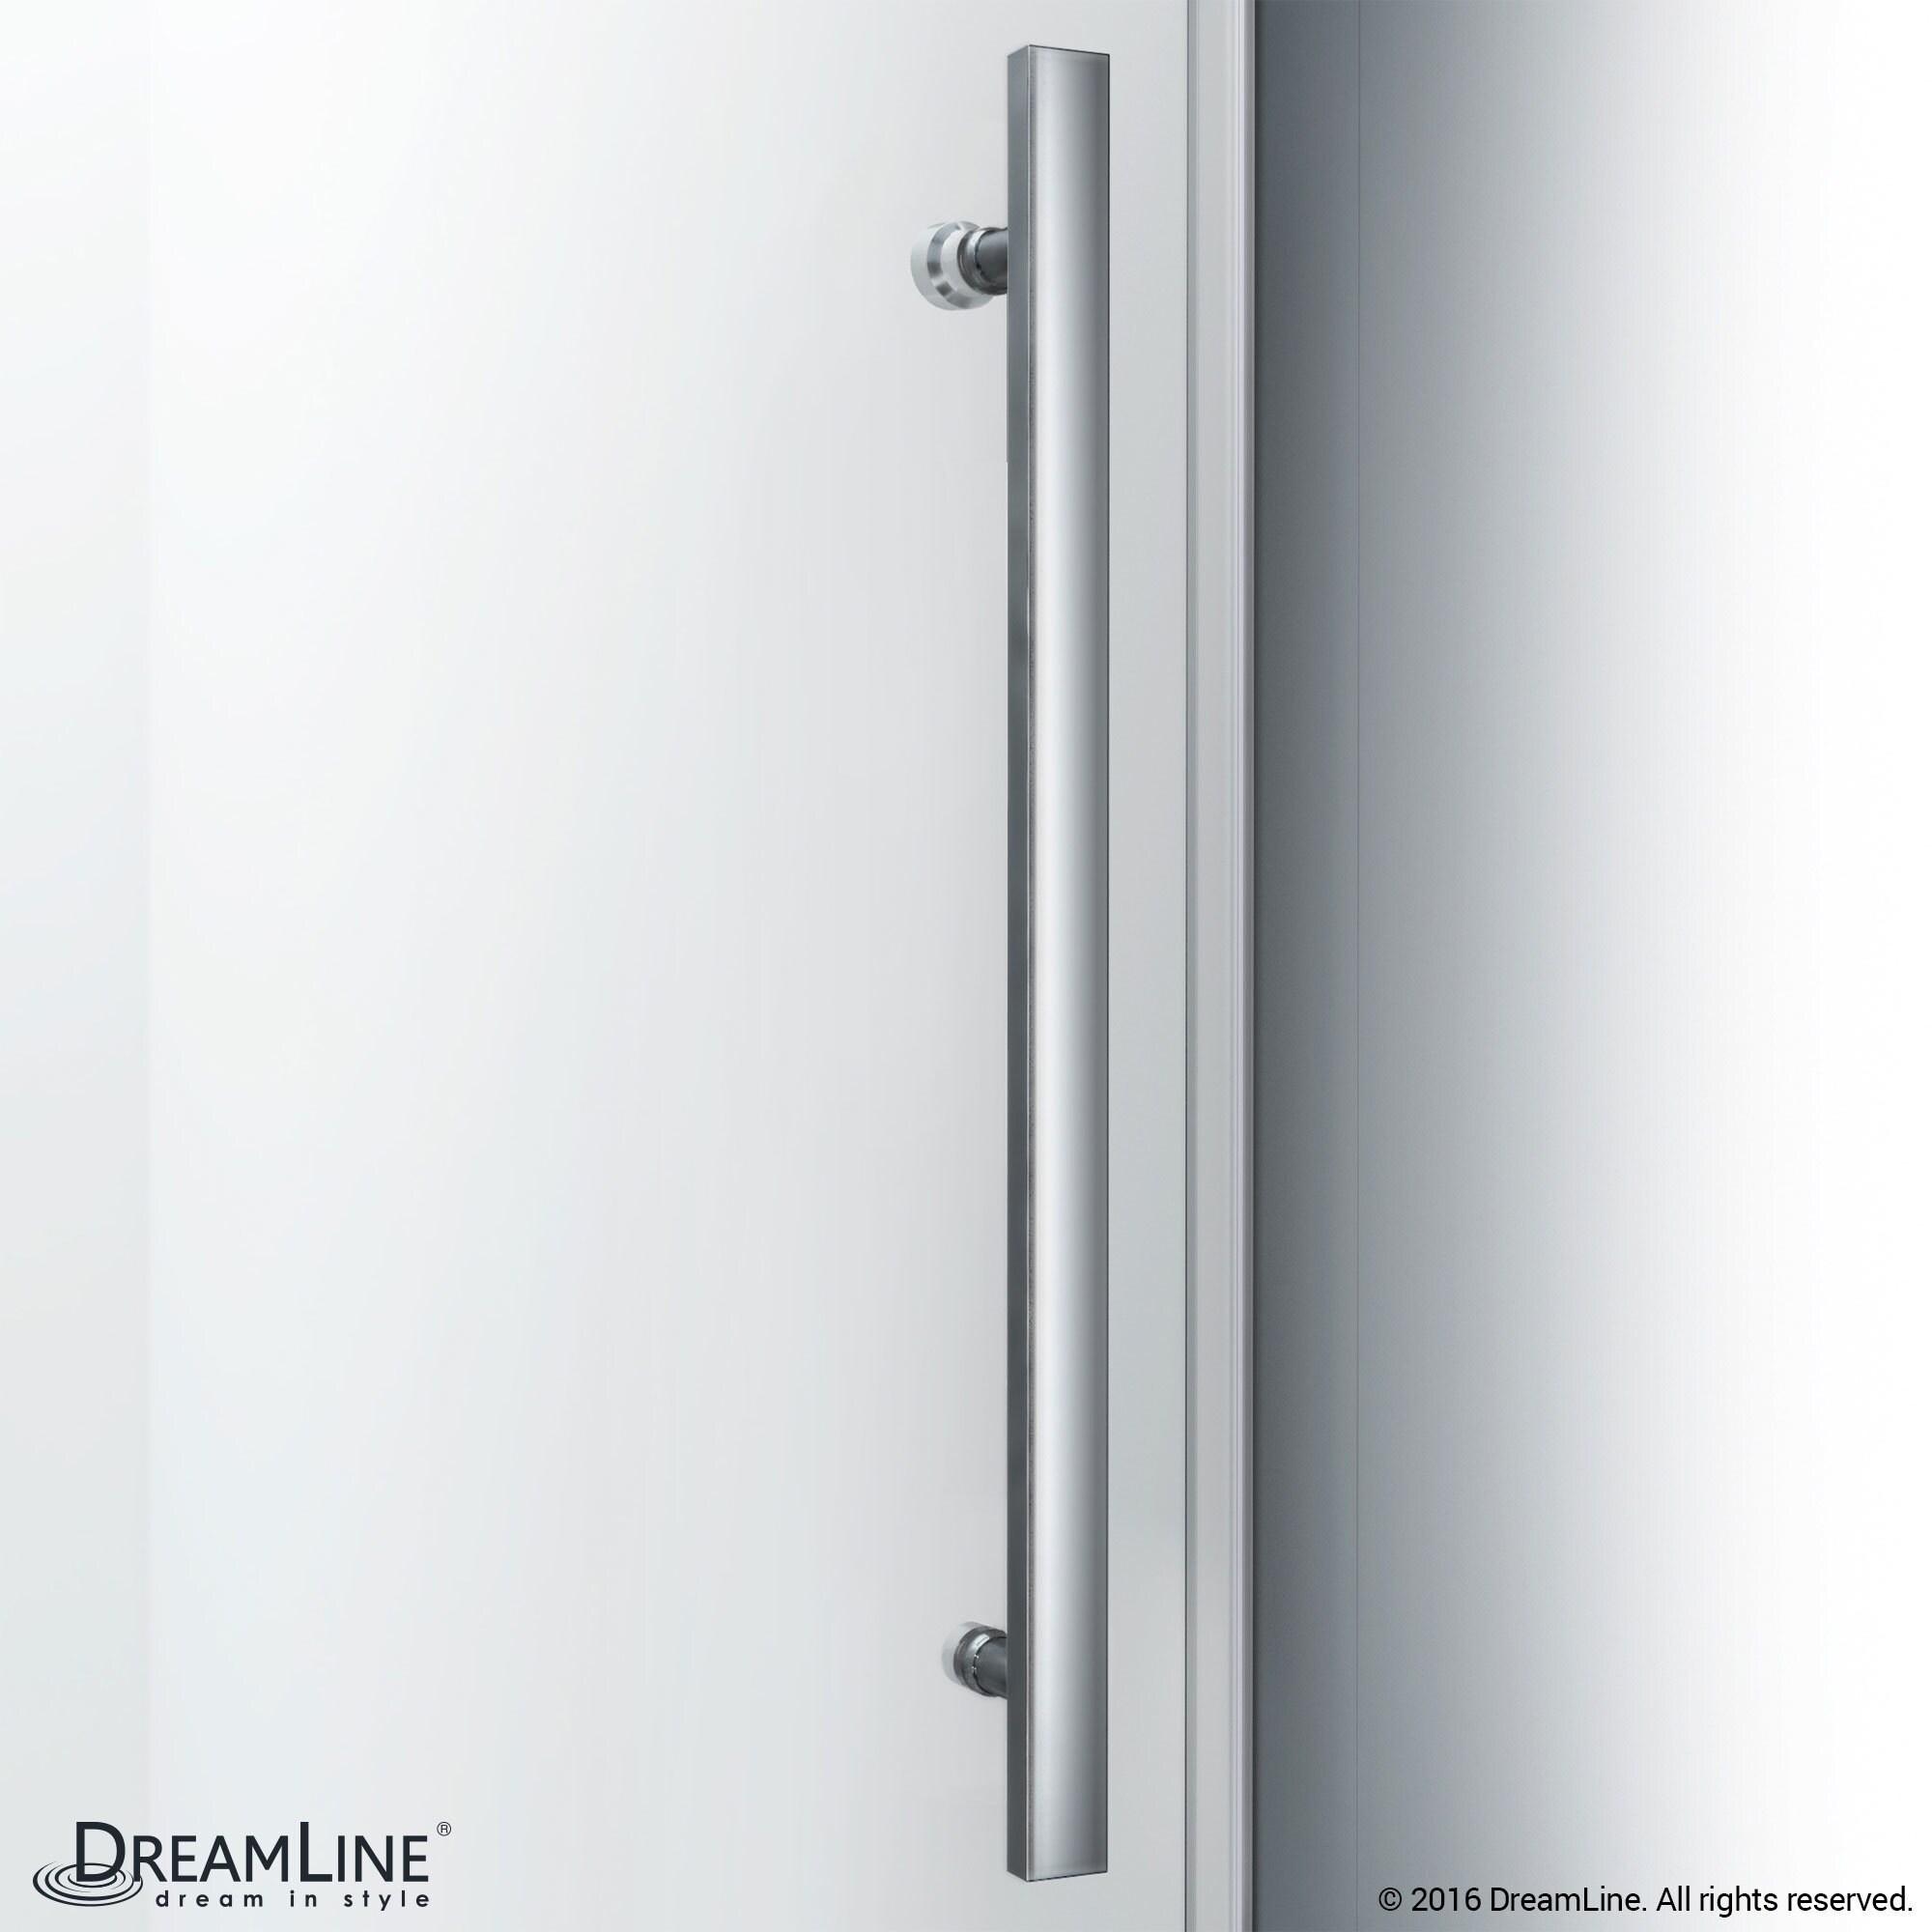 shower photo bronze info mine of u door pulls reflections courtesy the handle california knobs jessim handles joe